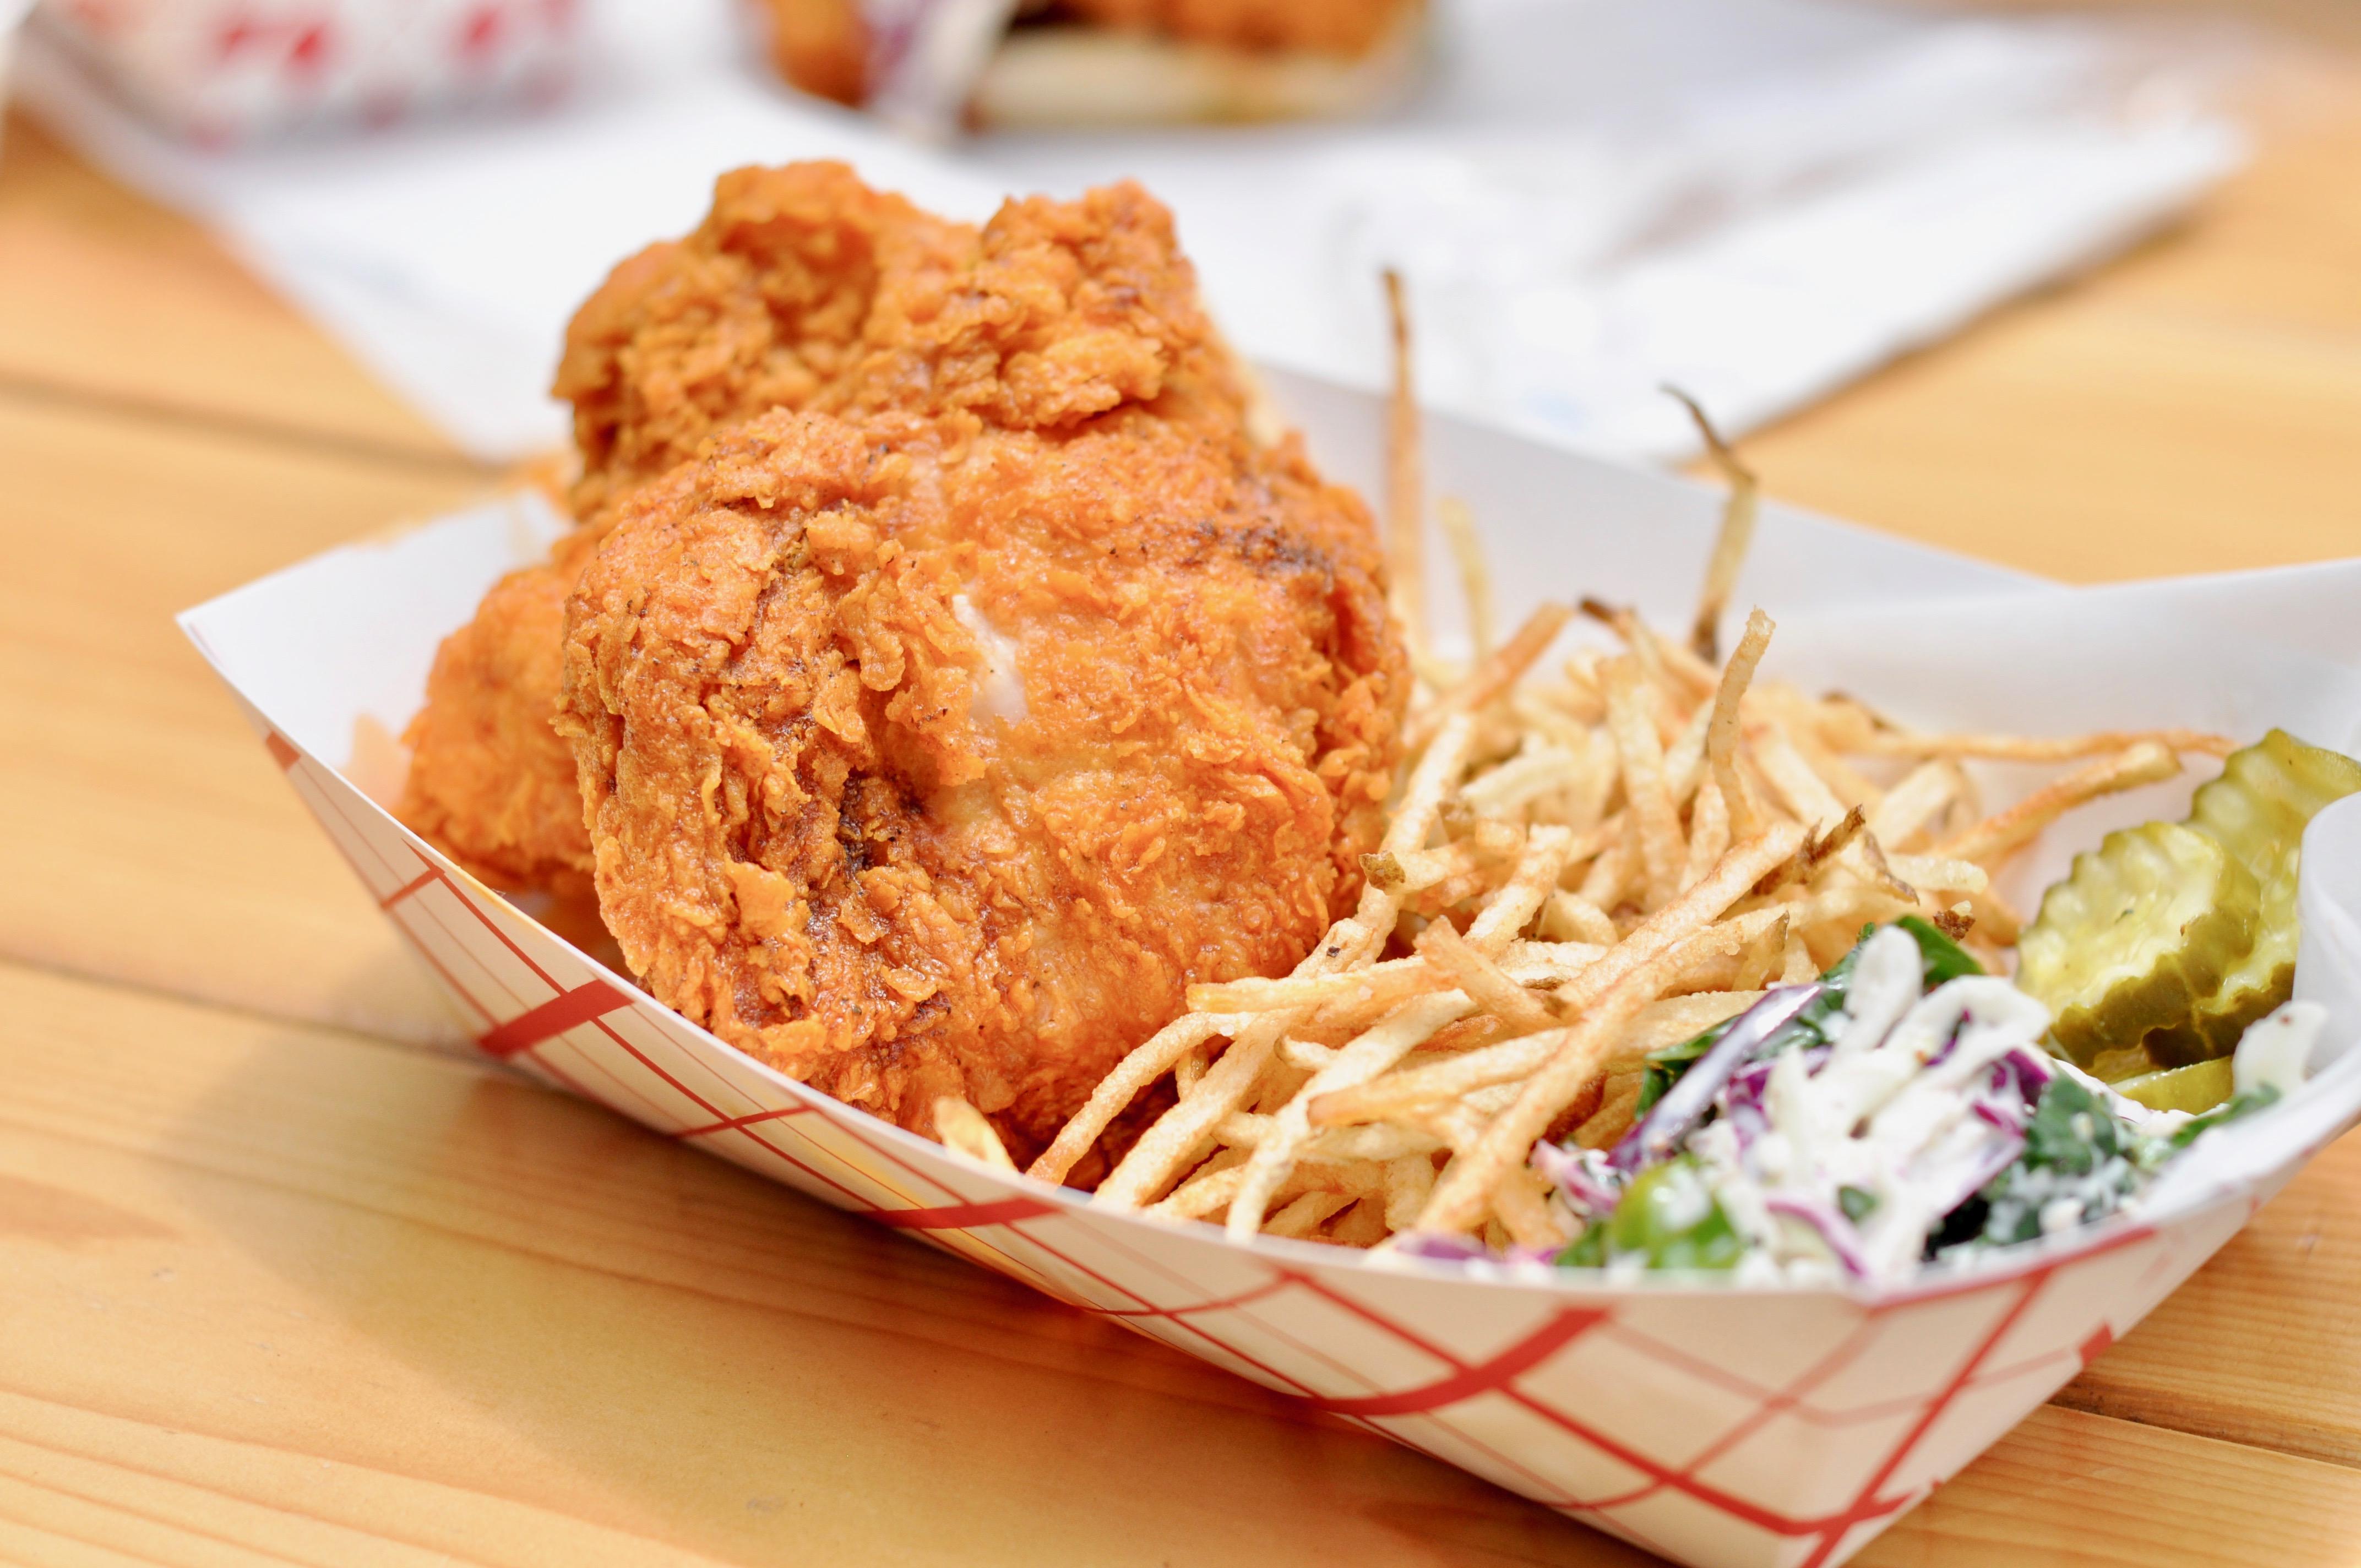 Tumble 22's hot chicken